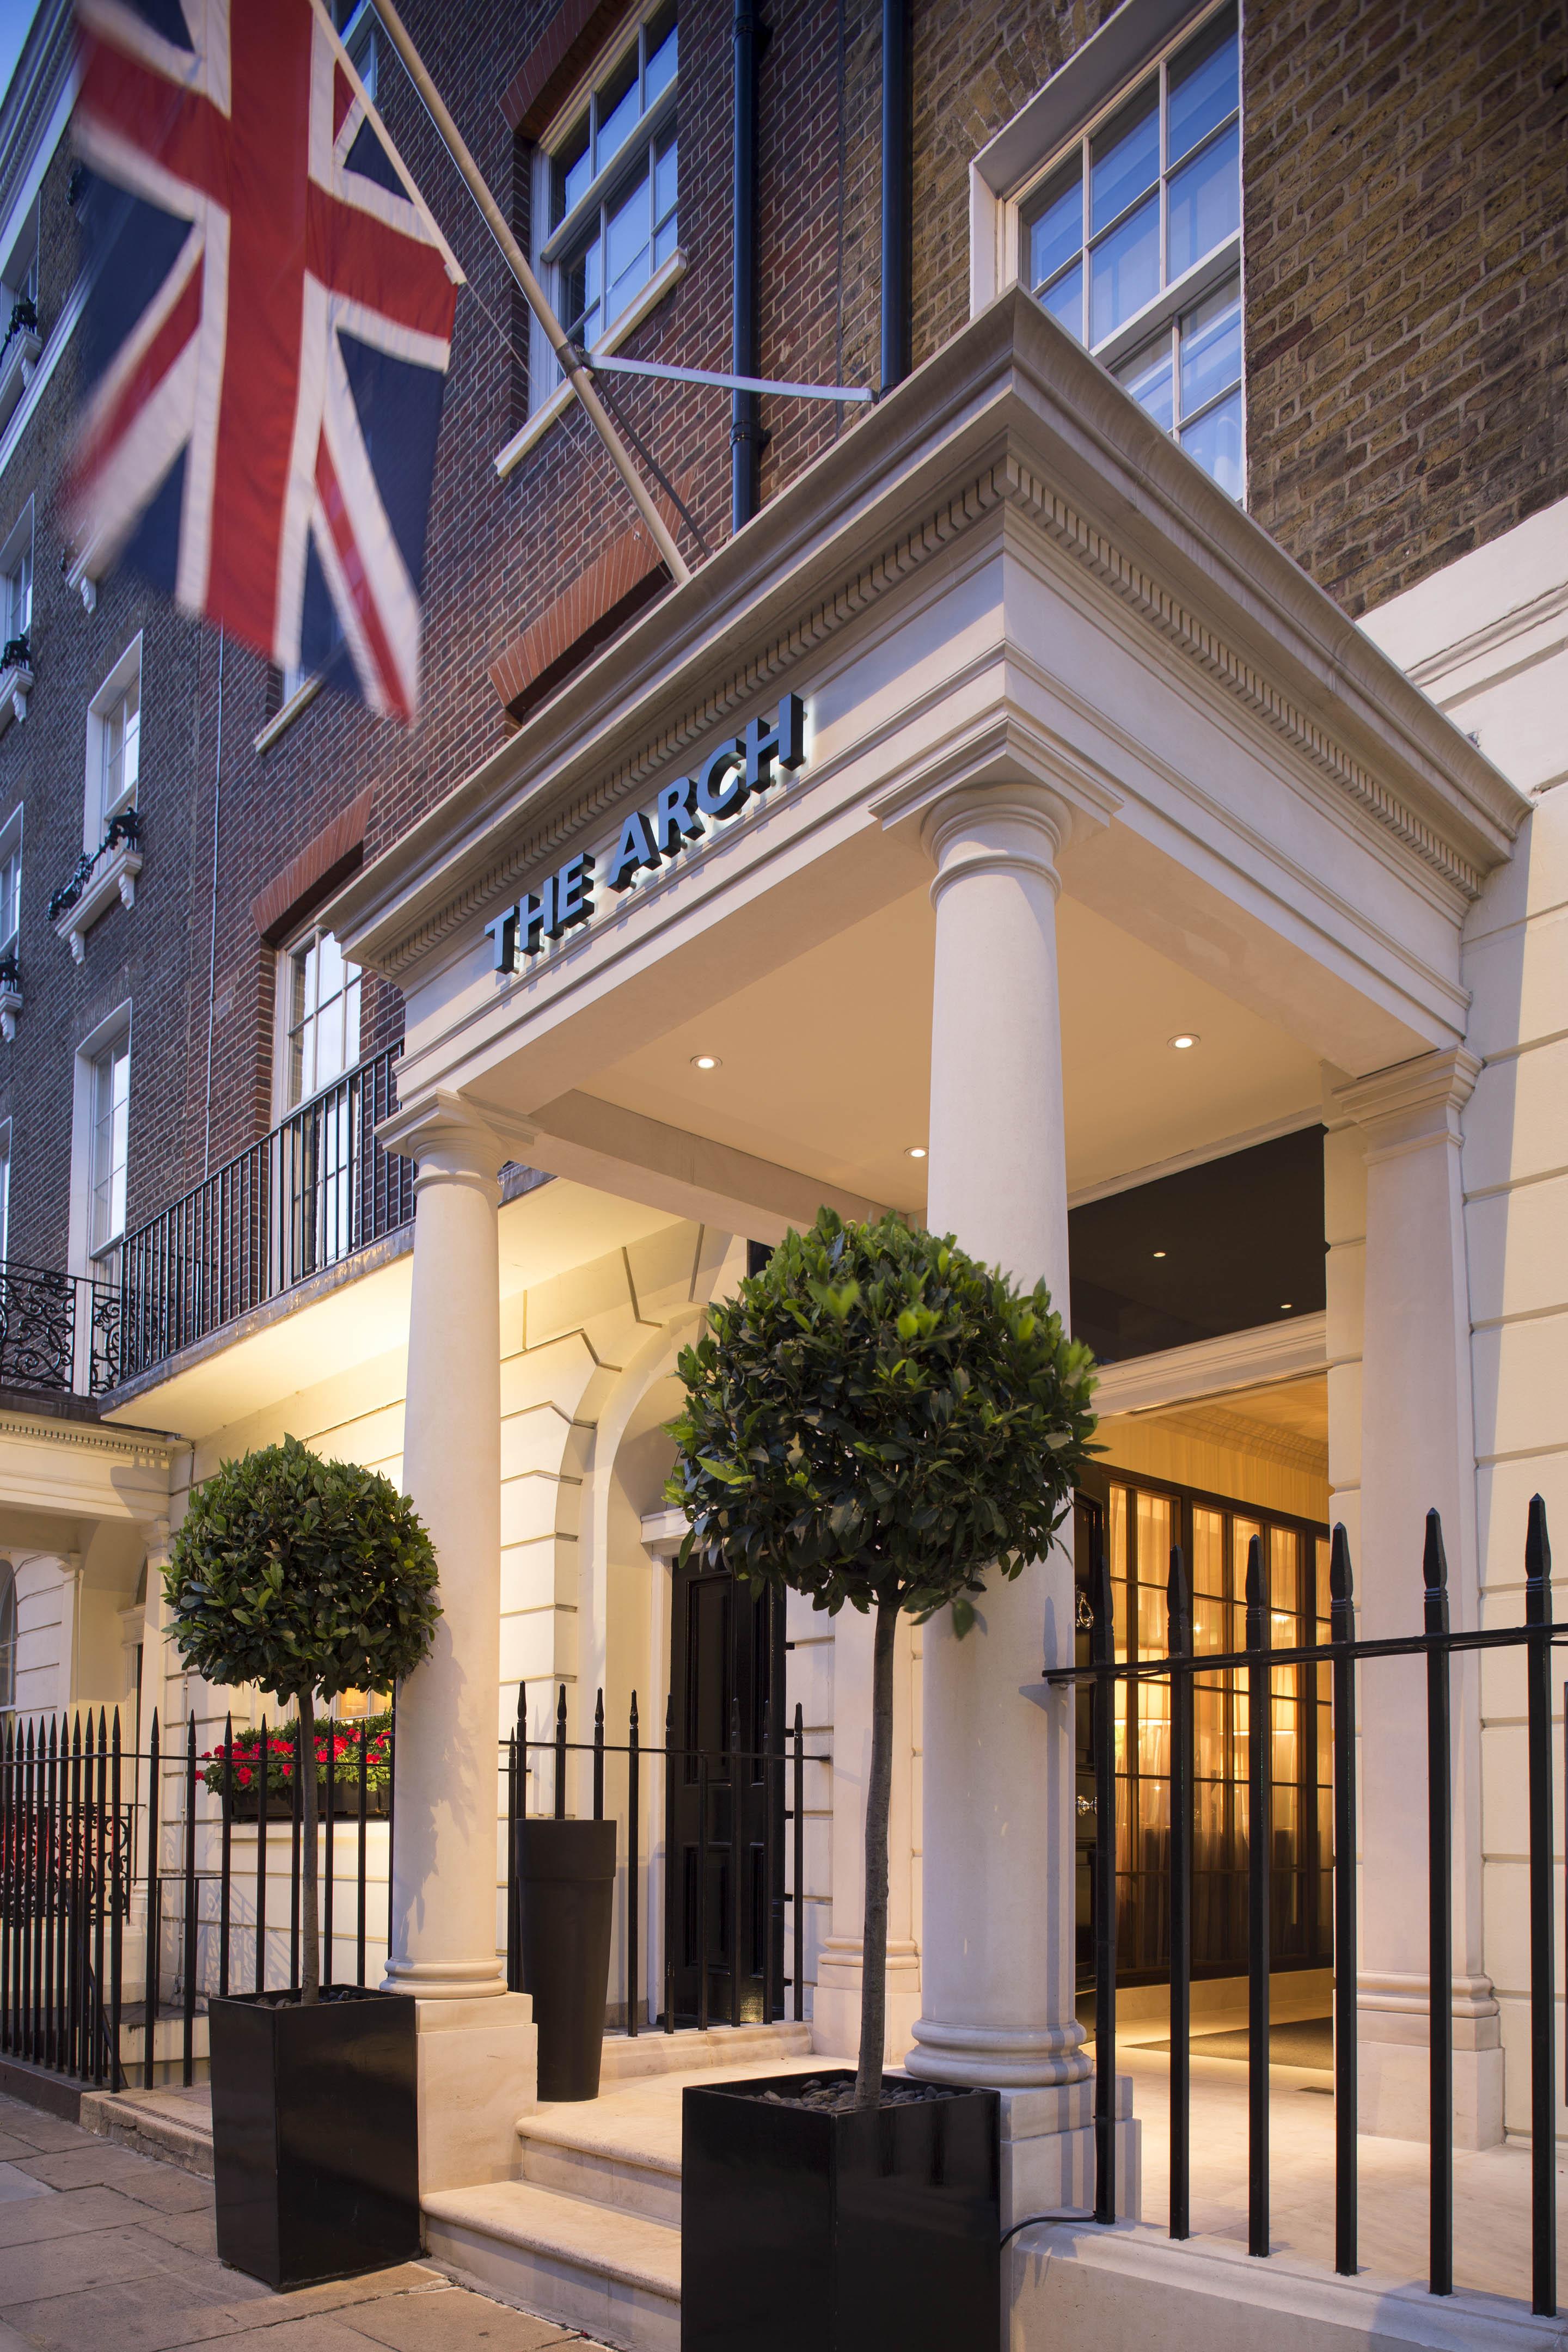 Kid friendly London hotel, London family hotels, London for families, child friendly hotels in London